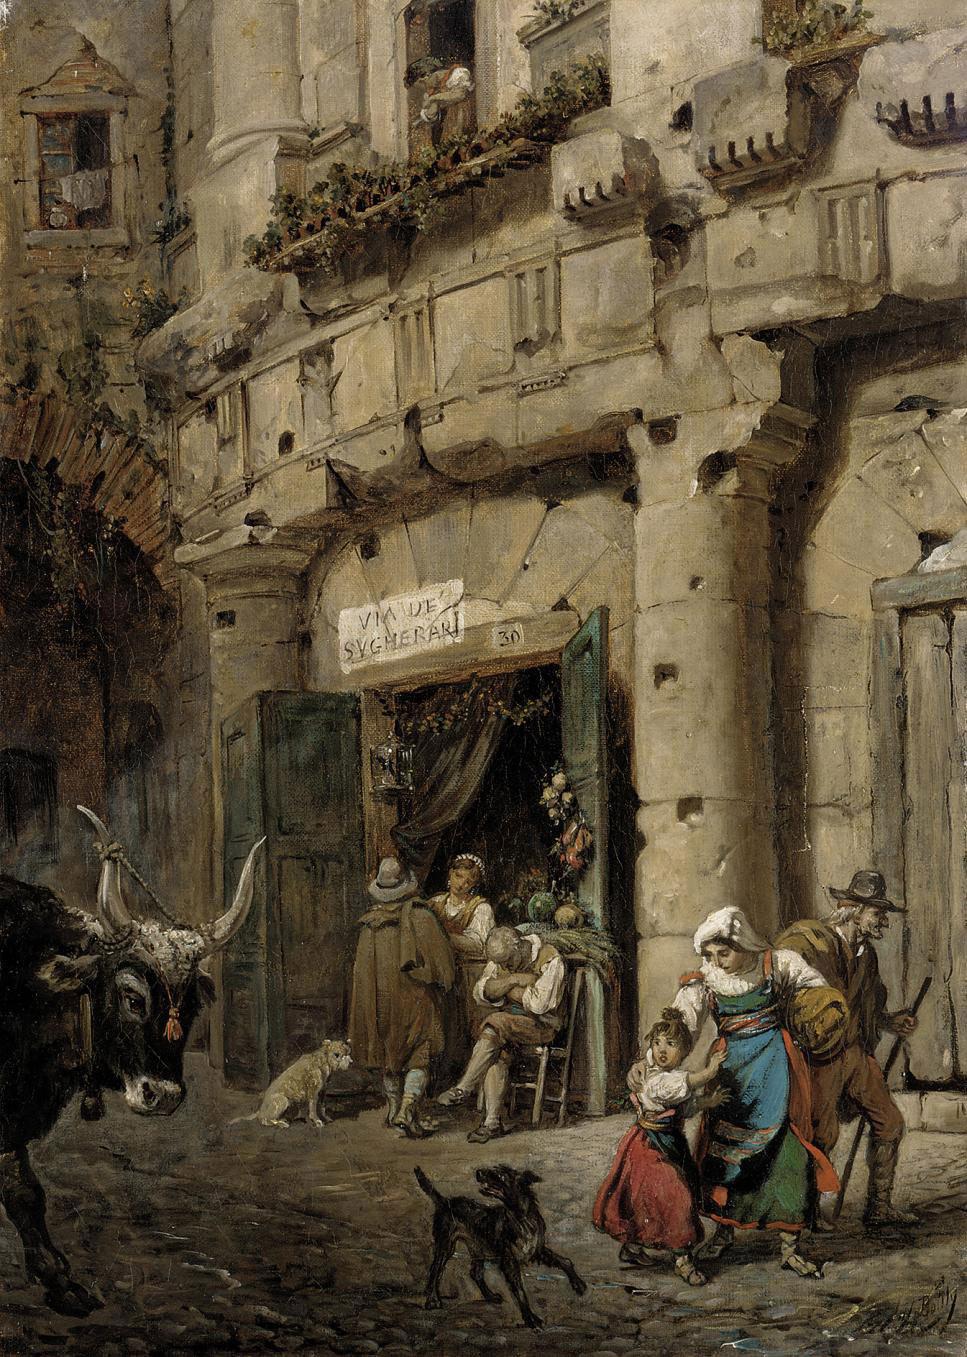 Selling vegetables on the Via de Sugherari, Rome